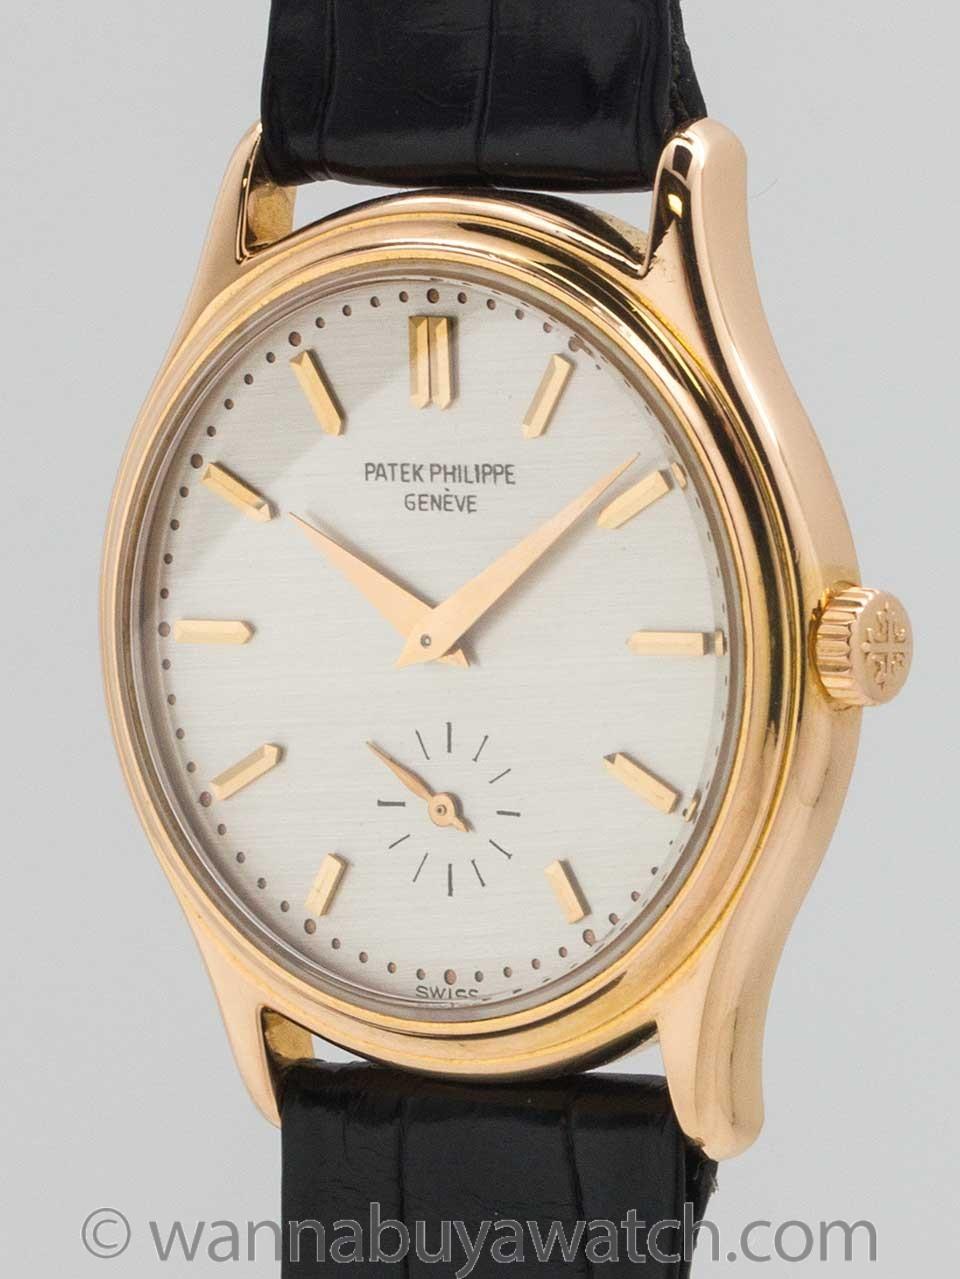 Patek Philippe ref 3923 18K PG circa 1990